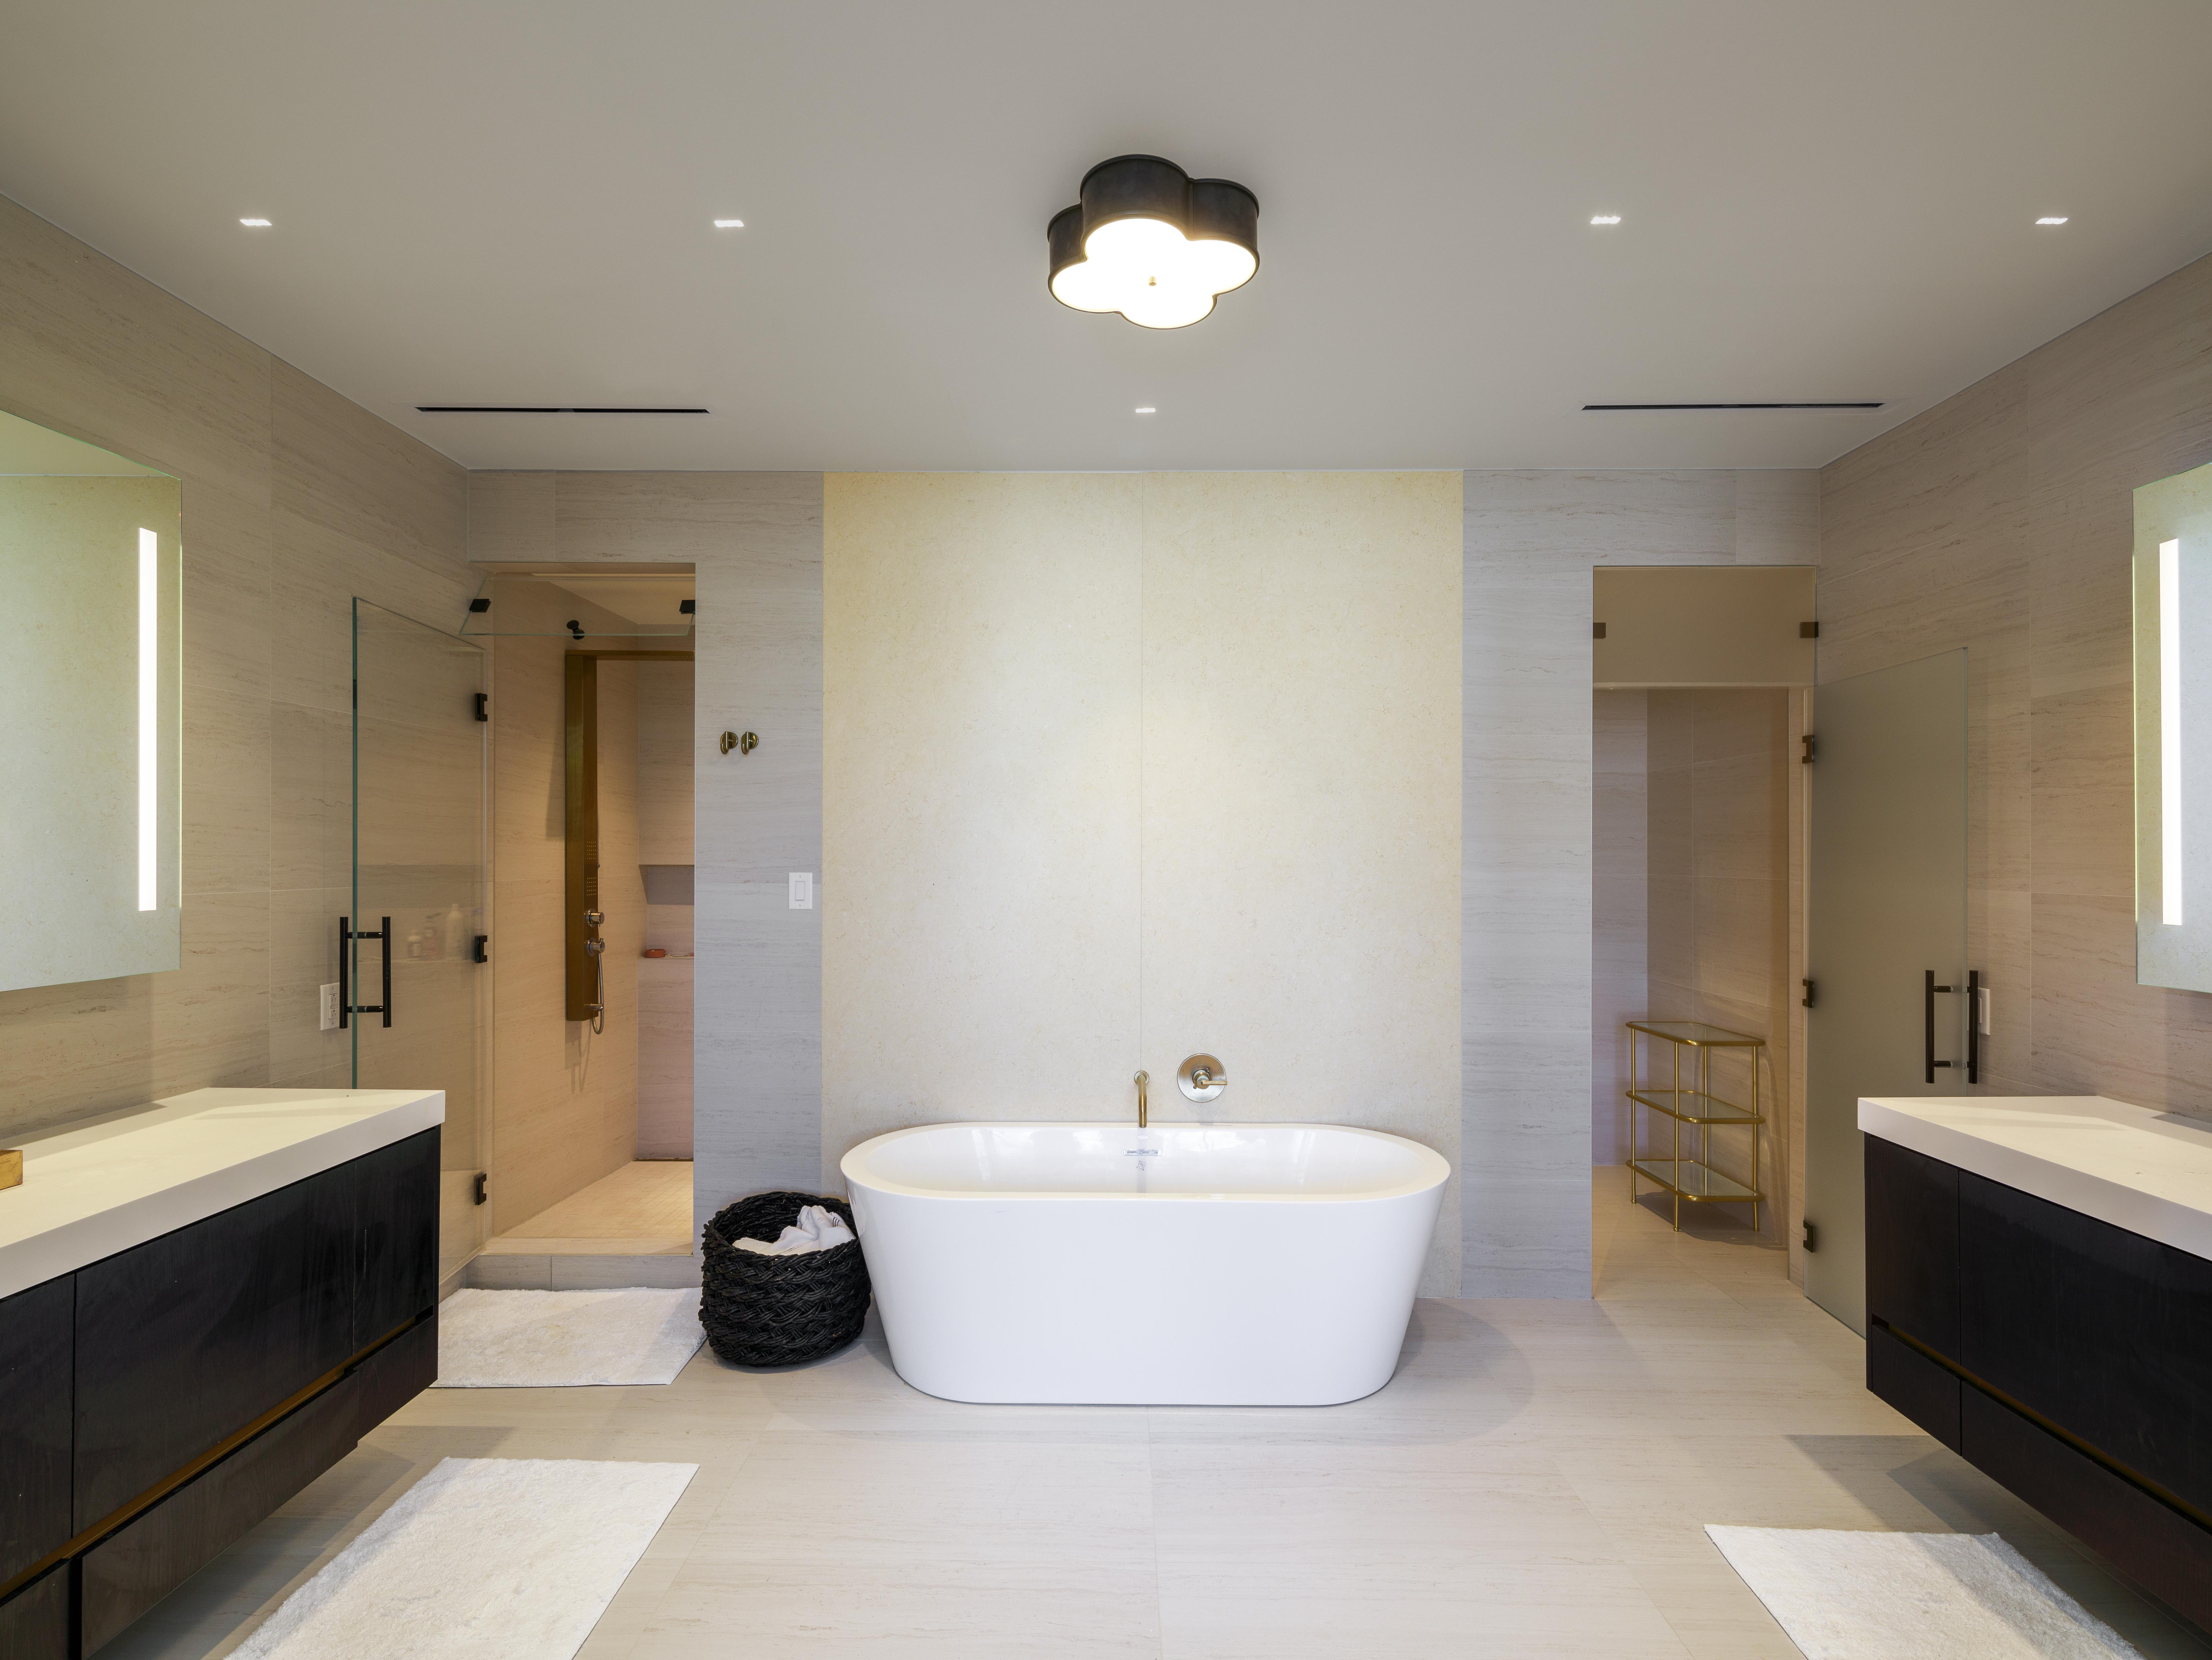 Penthouse_4Bed_MasterBathroom